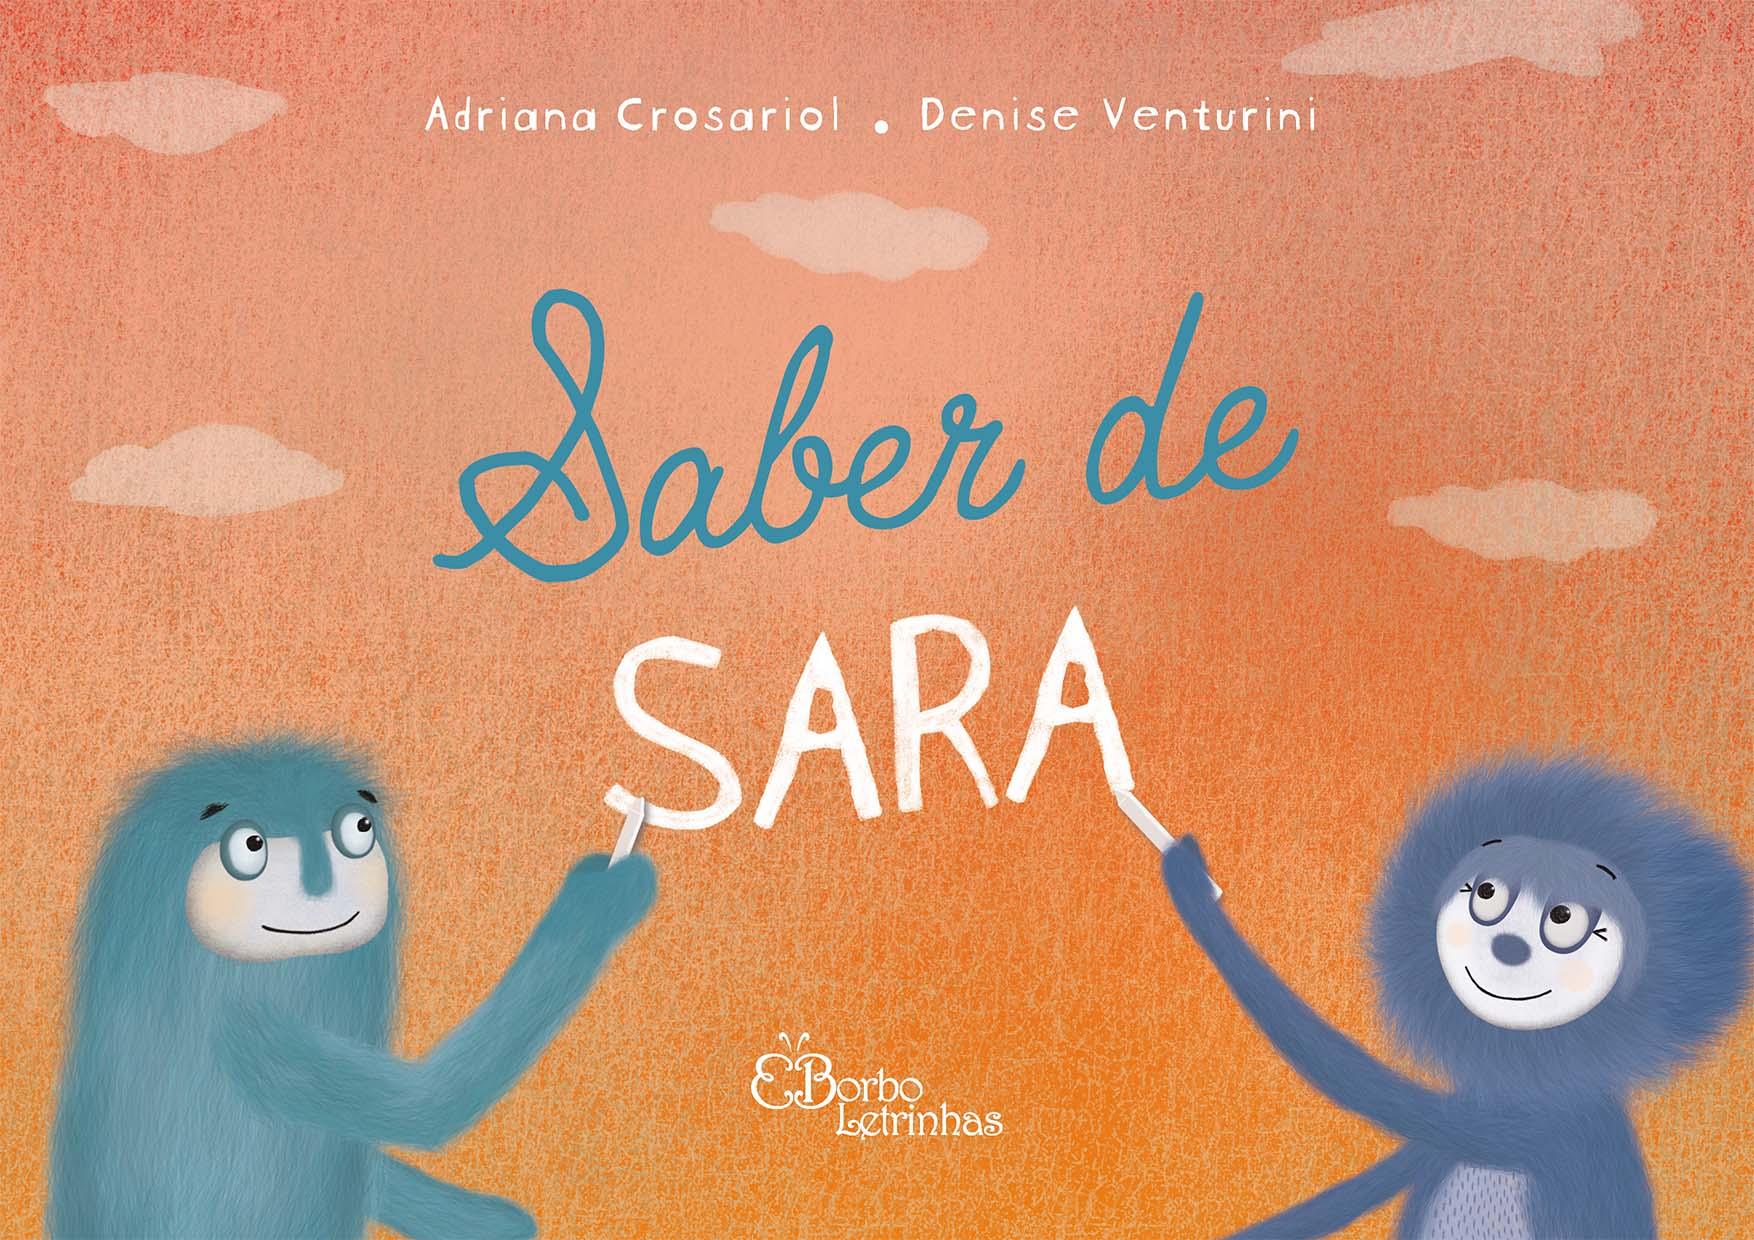 Saber de Sara